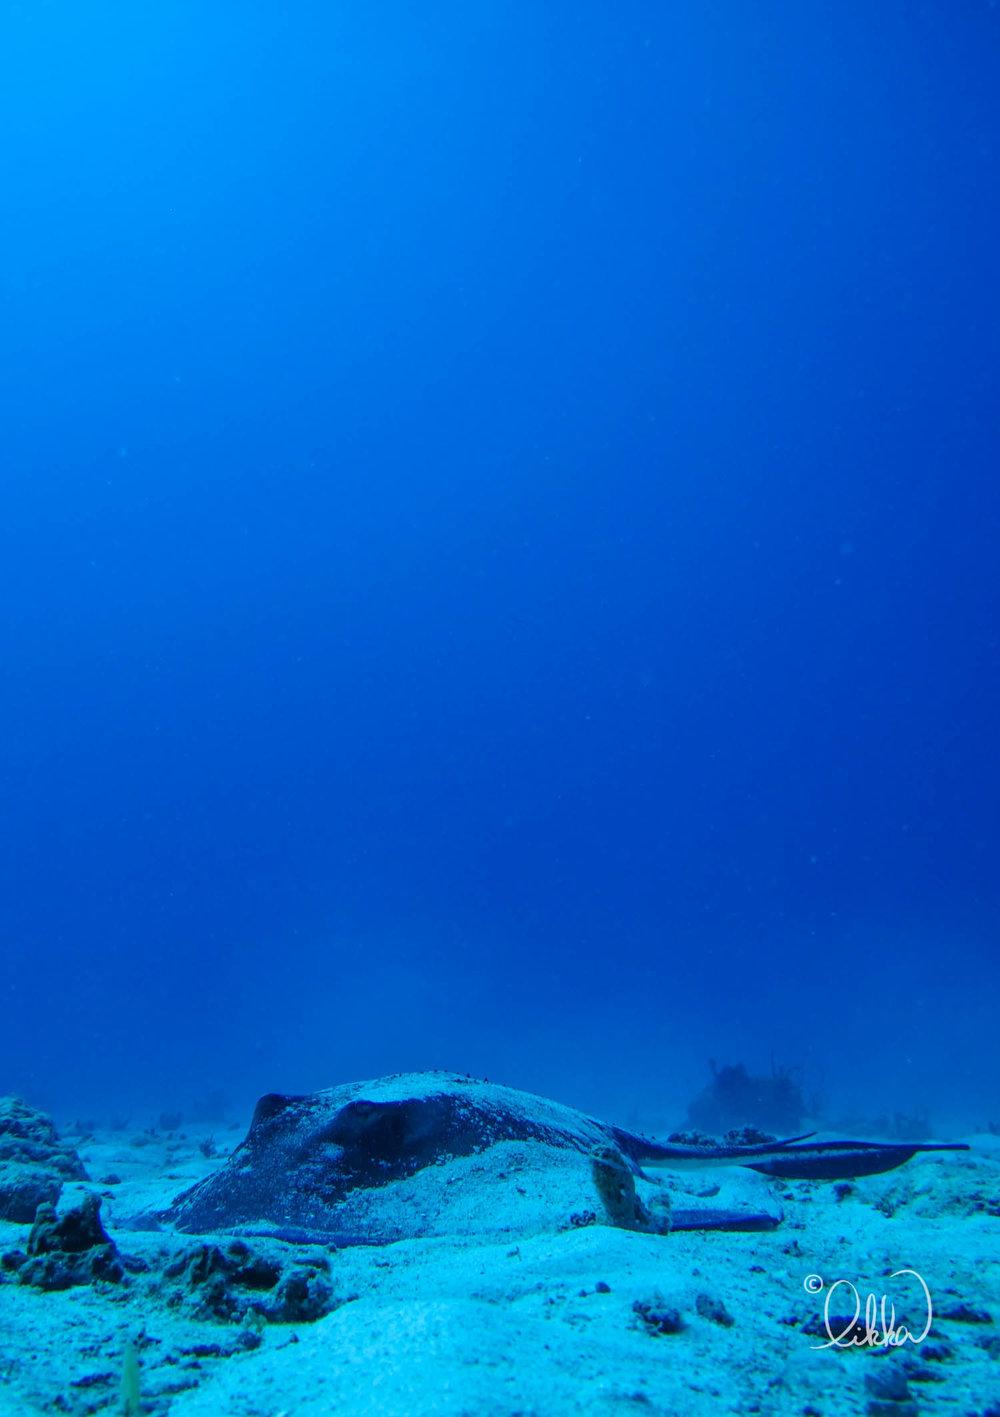 blue-likka-21.jpg